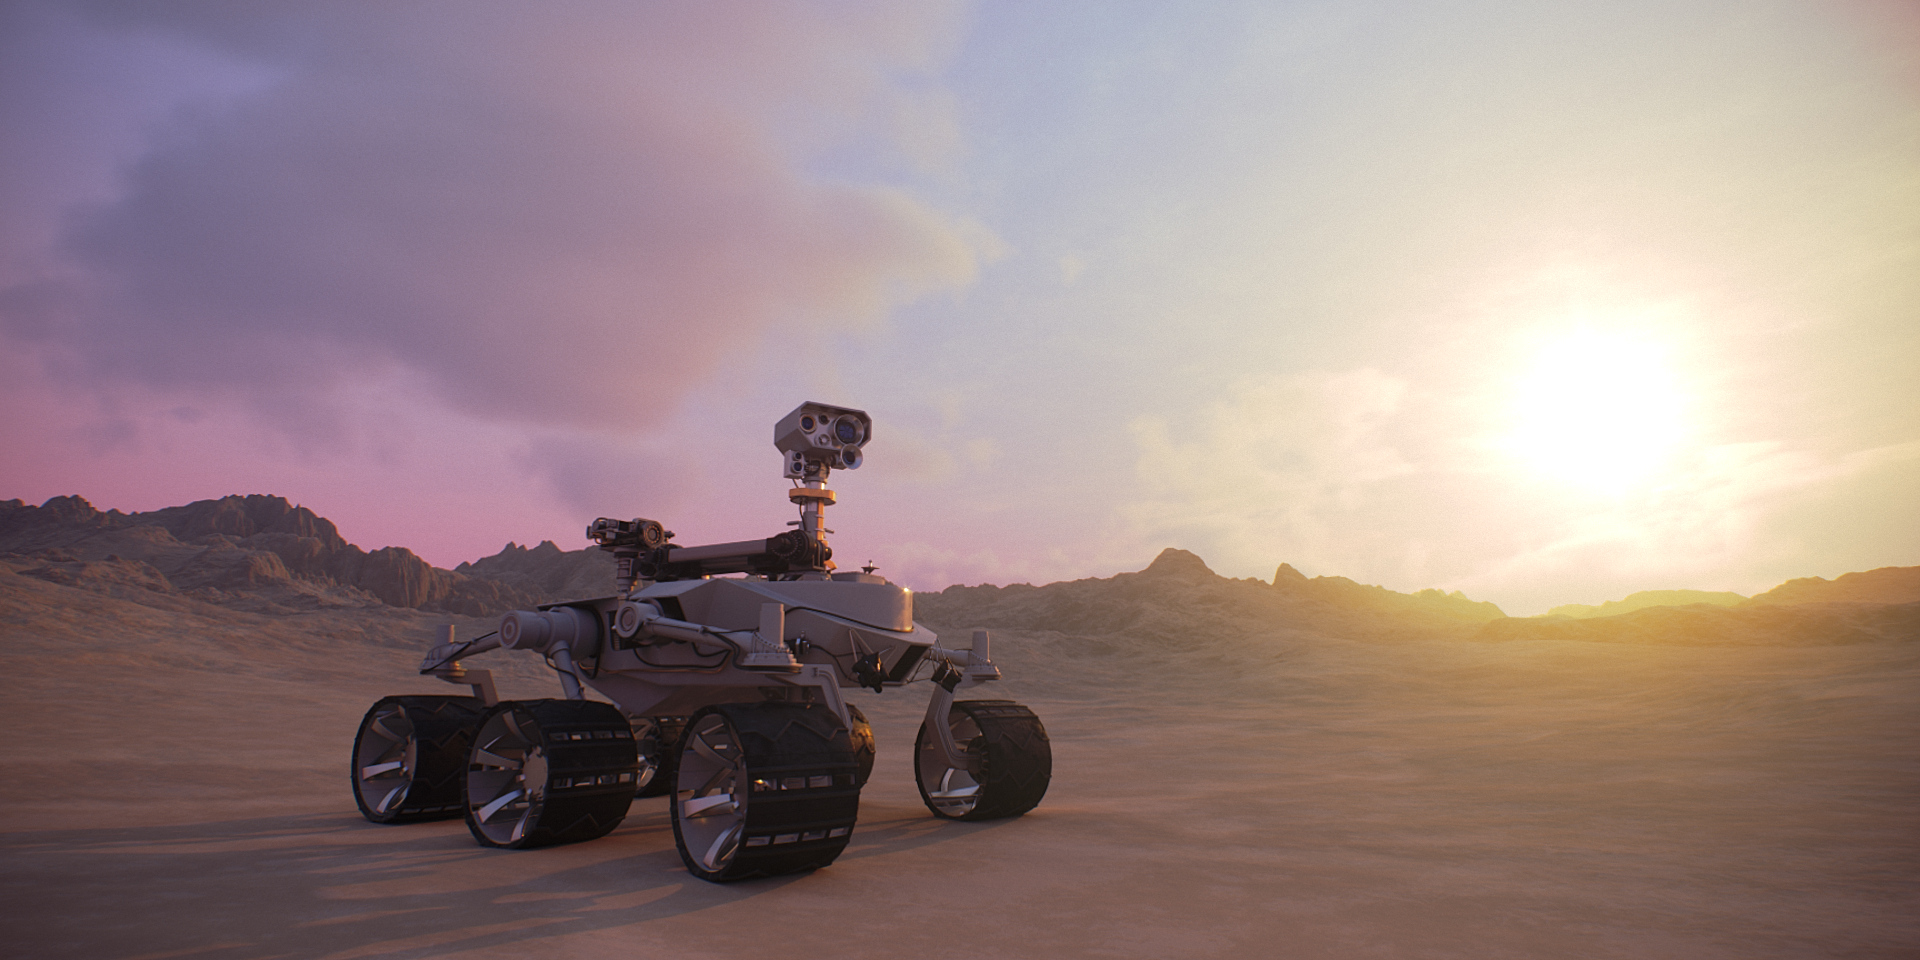 Rover Scene Alien Skies 04 Camera A.jpg